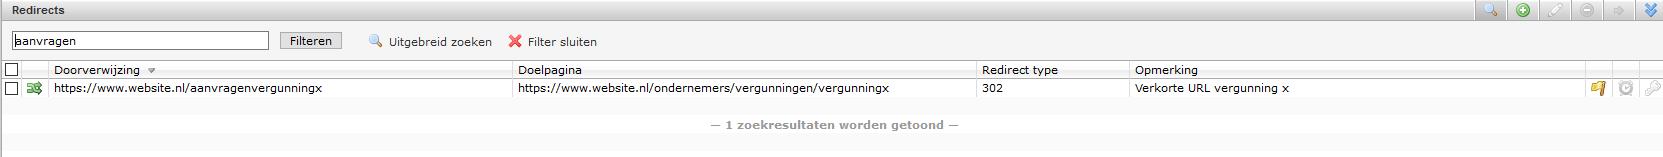 screenshot of the searchbar